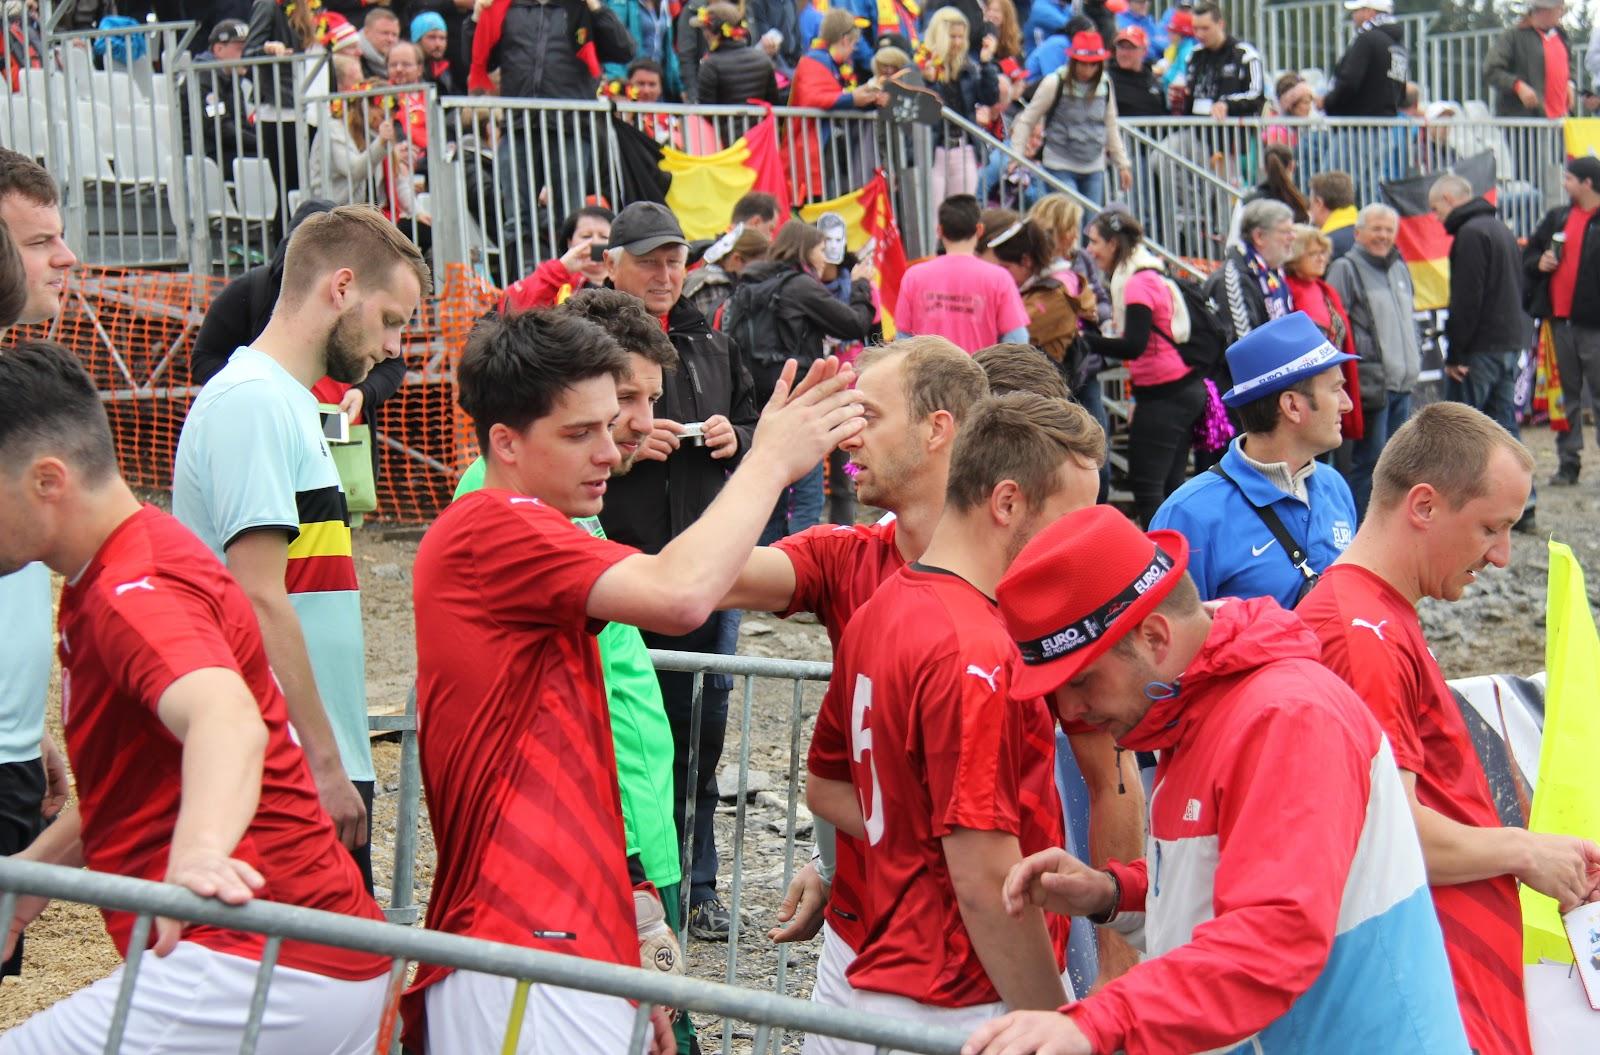 EURO 2016 - Morzine: Den třetí - Belgie